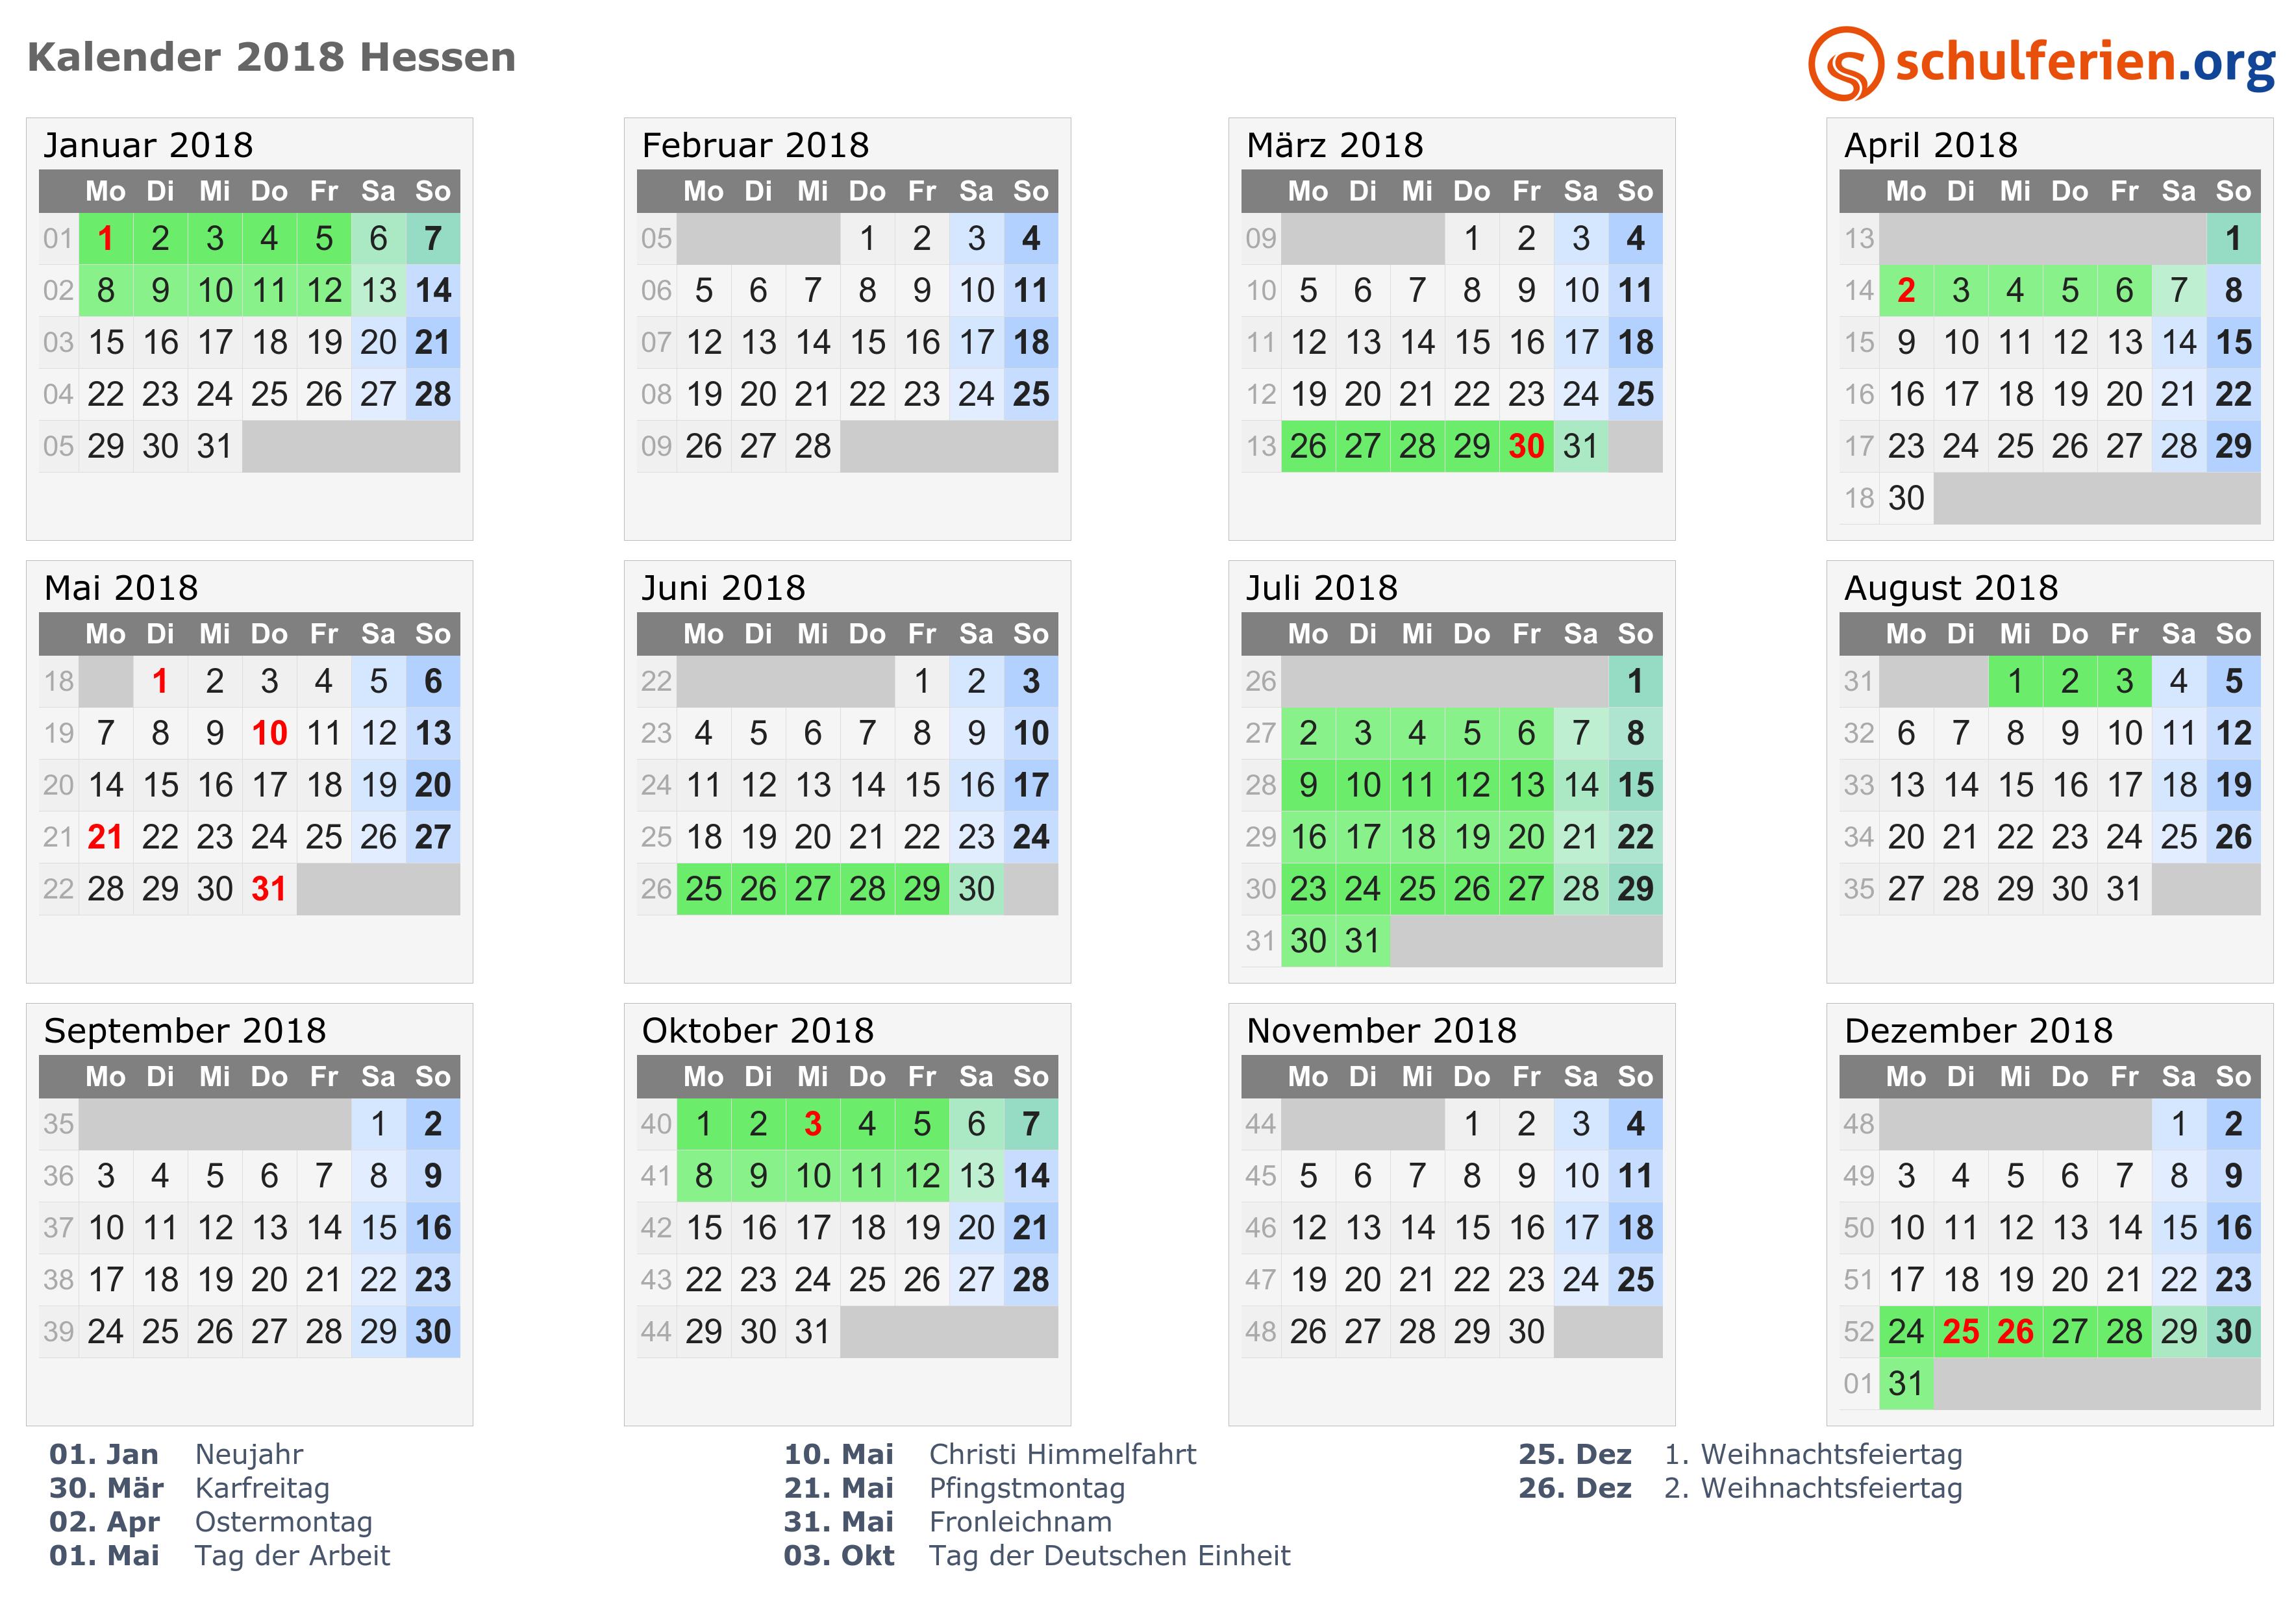 kalender 2018 ferien hessen feiertage. Black Bedroom Furniture Sets. Home Design Ideas